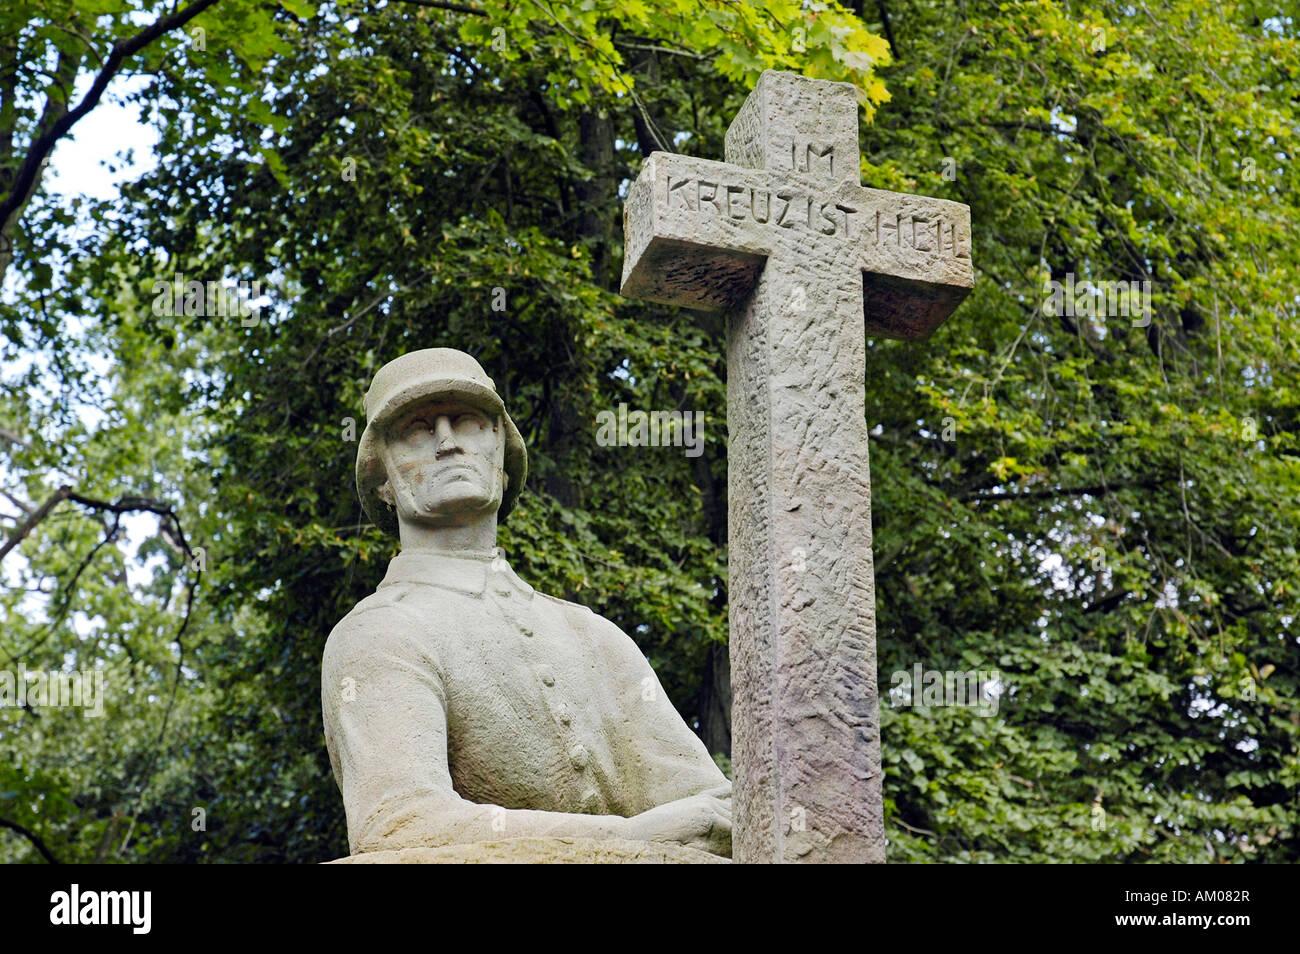 War memorial, Vinsebeck, Steinheim, North Rhine-Westphalia, NRW, Germany Stock Photo